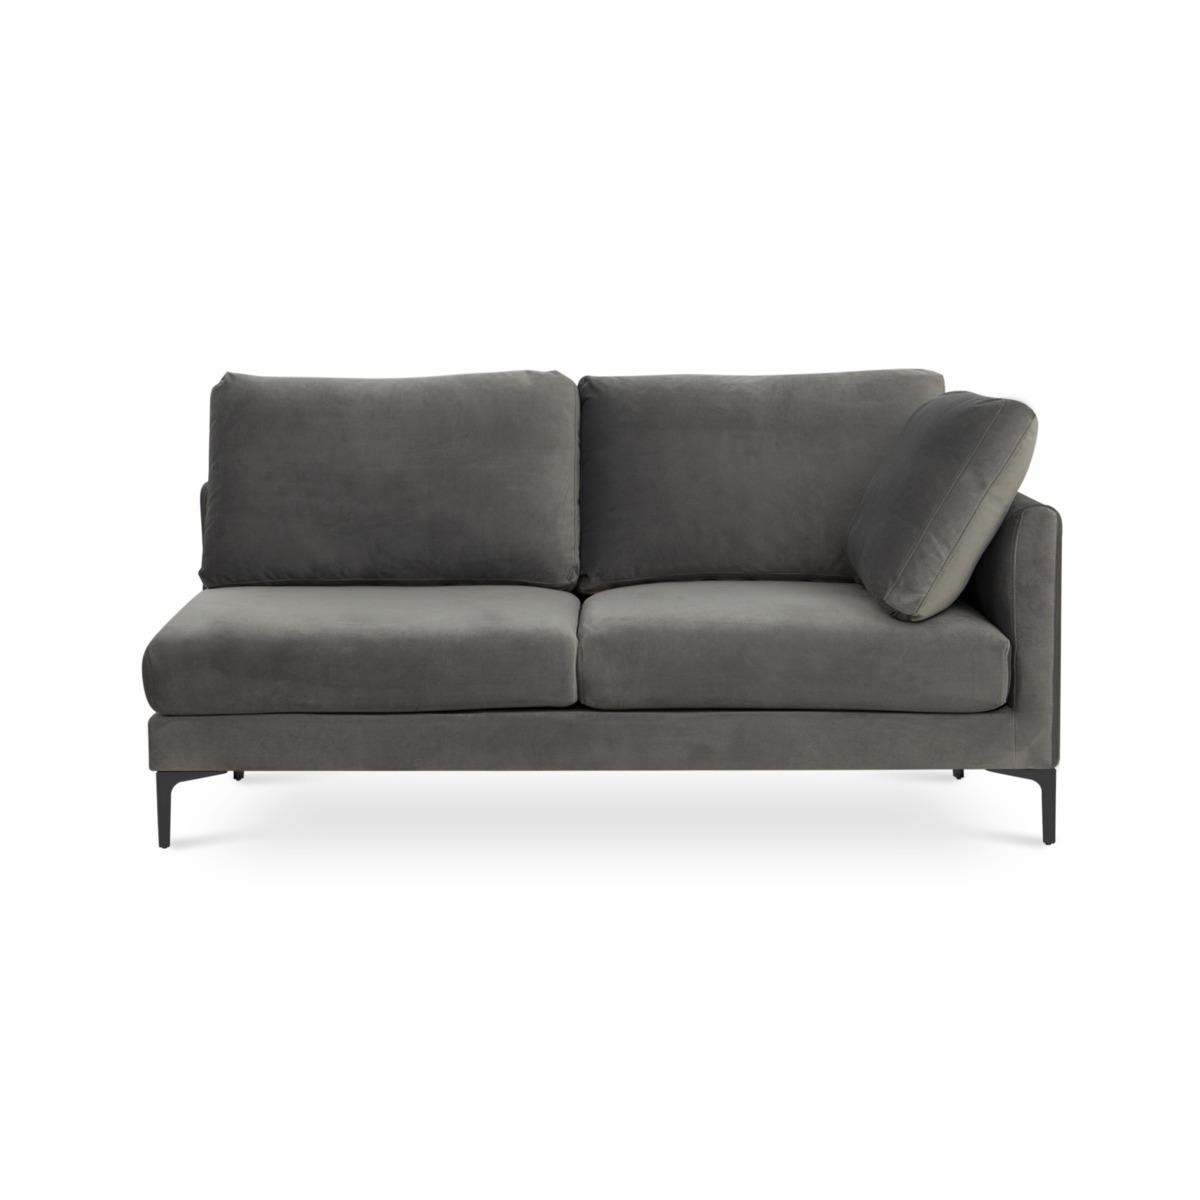 Adams 2-Seater Right Facing, Fog Grey Velvet (Black Leg)